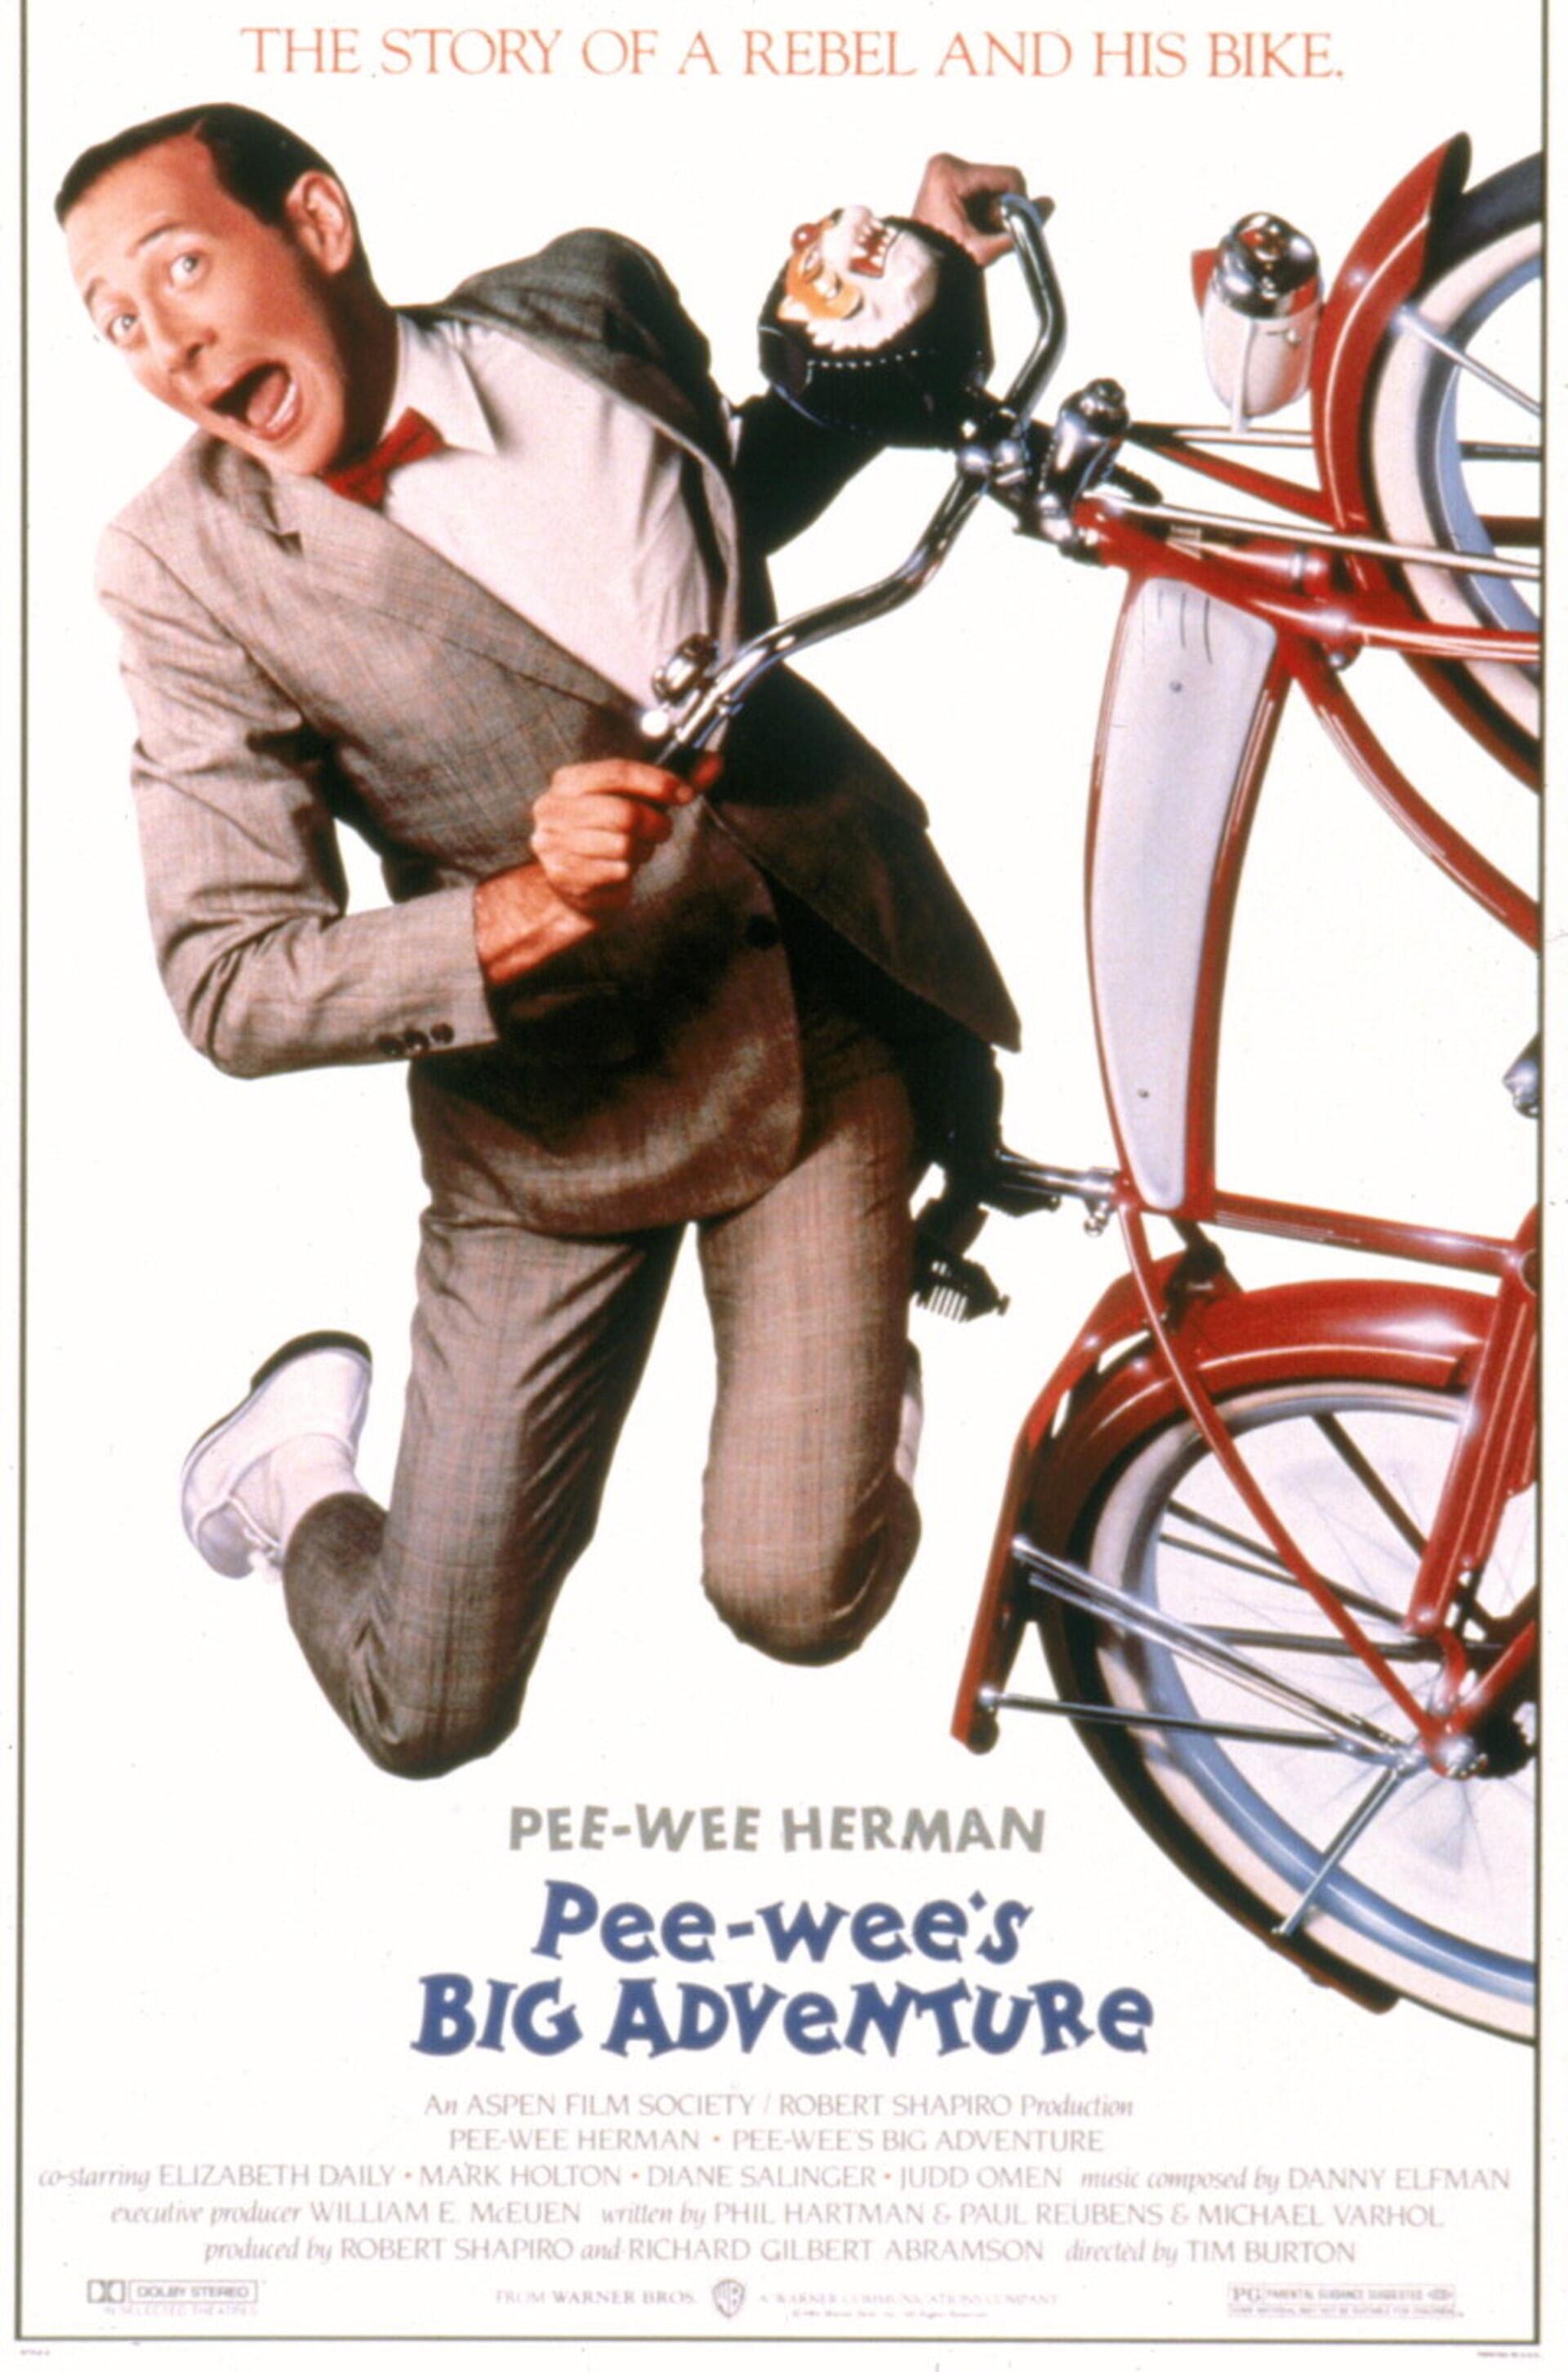 Pee-wee's Big Adventure - Poster 1